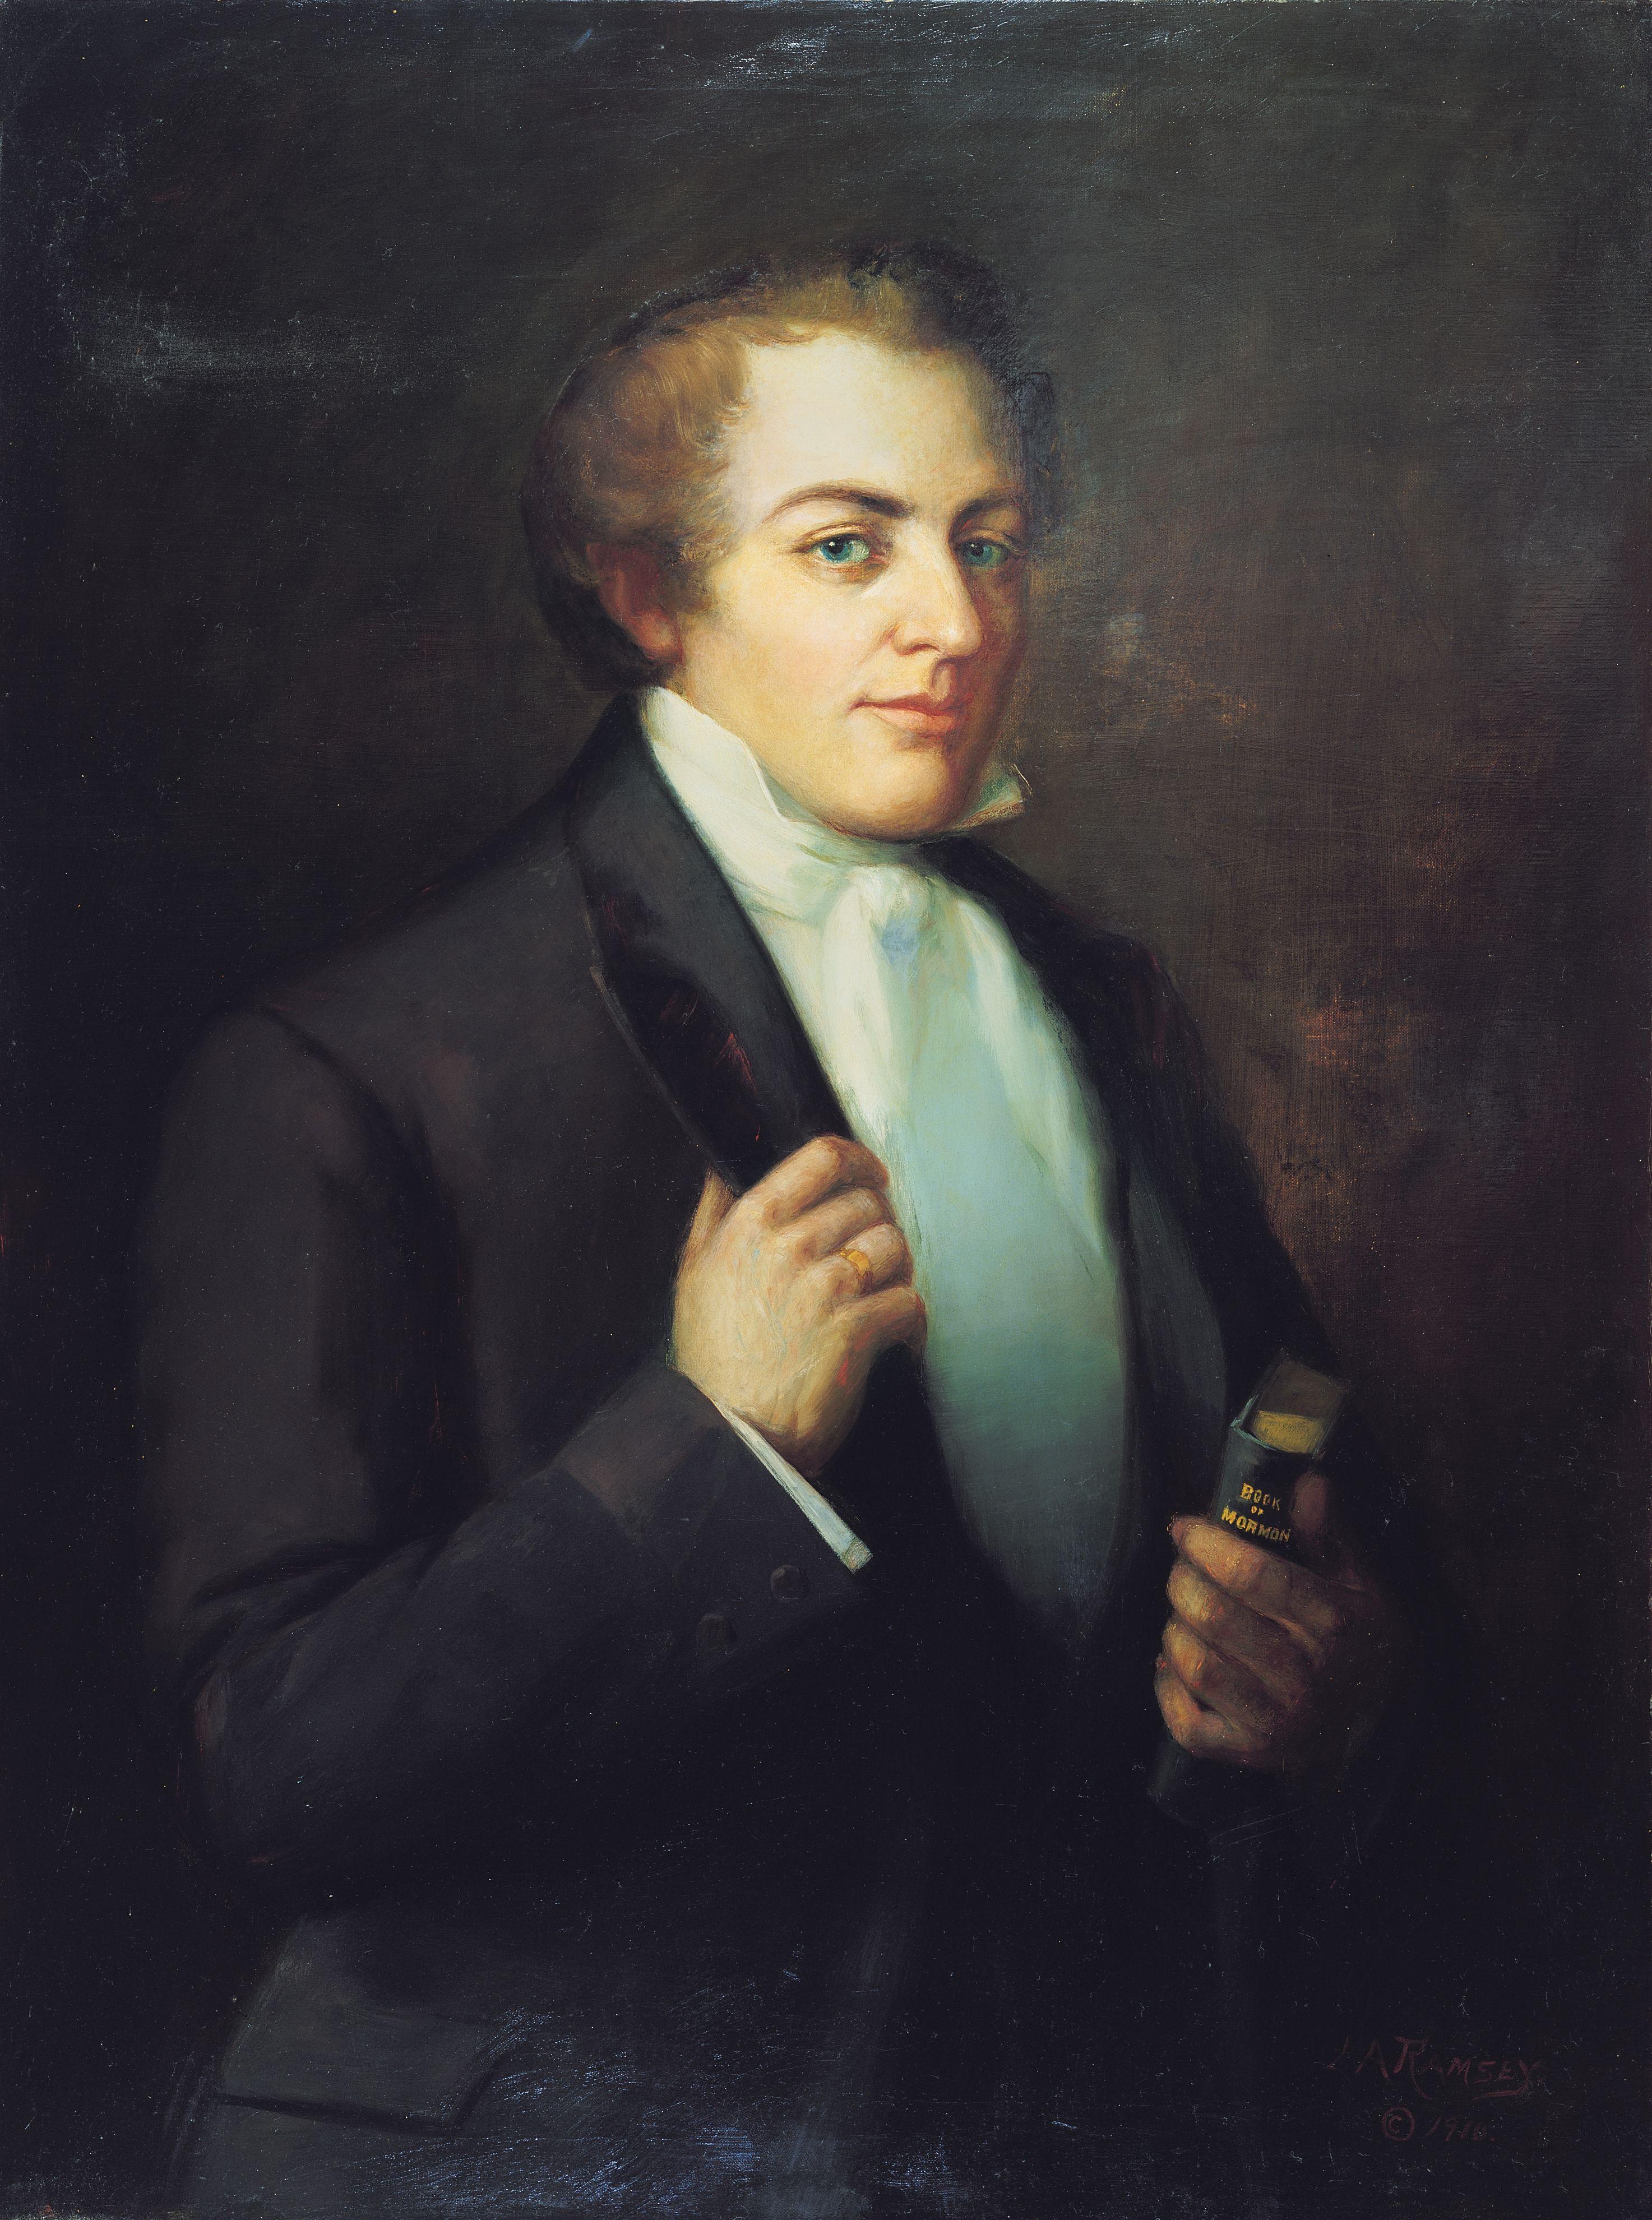 Joseph Smith, Jr., by Lewis A. Ramsey